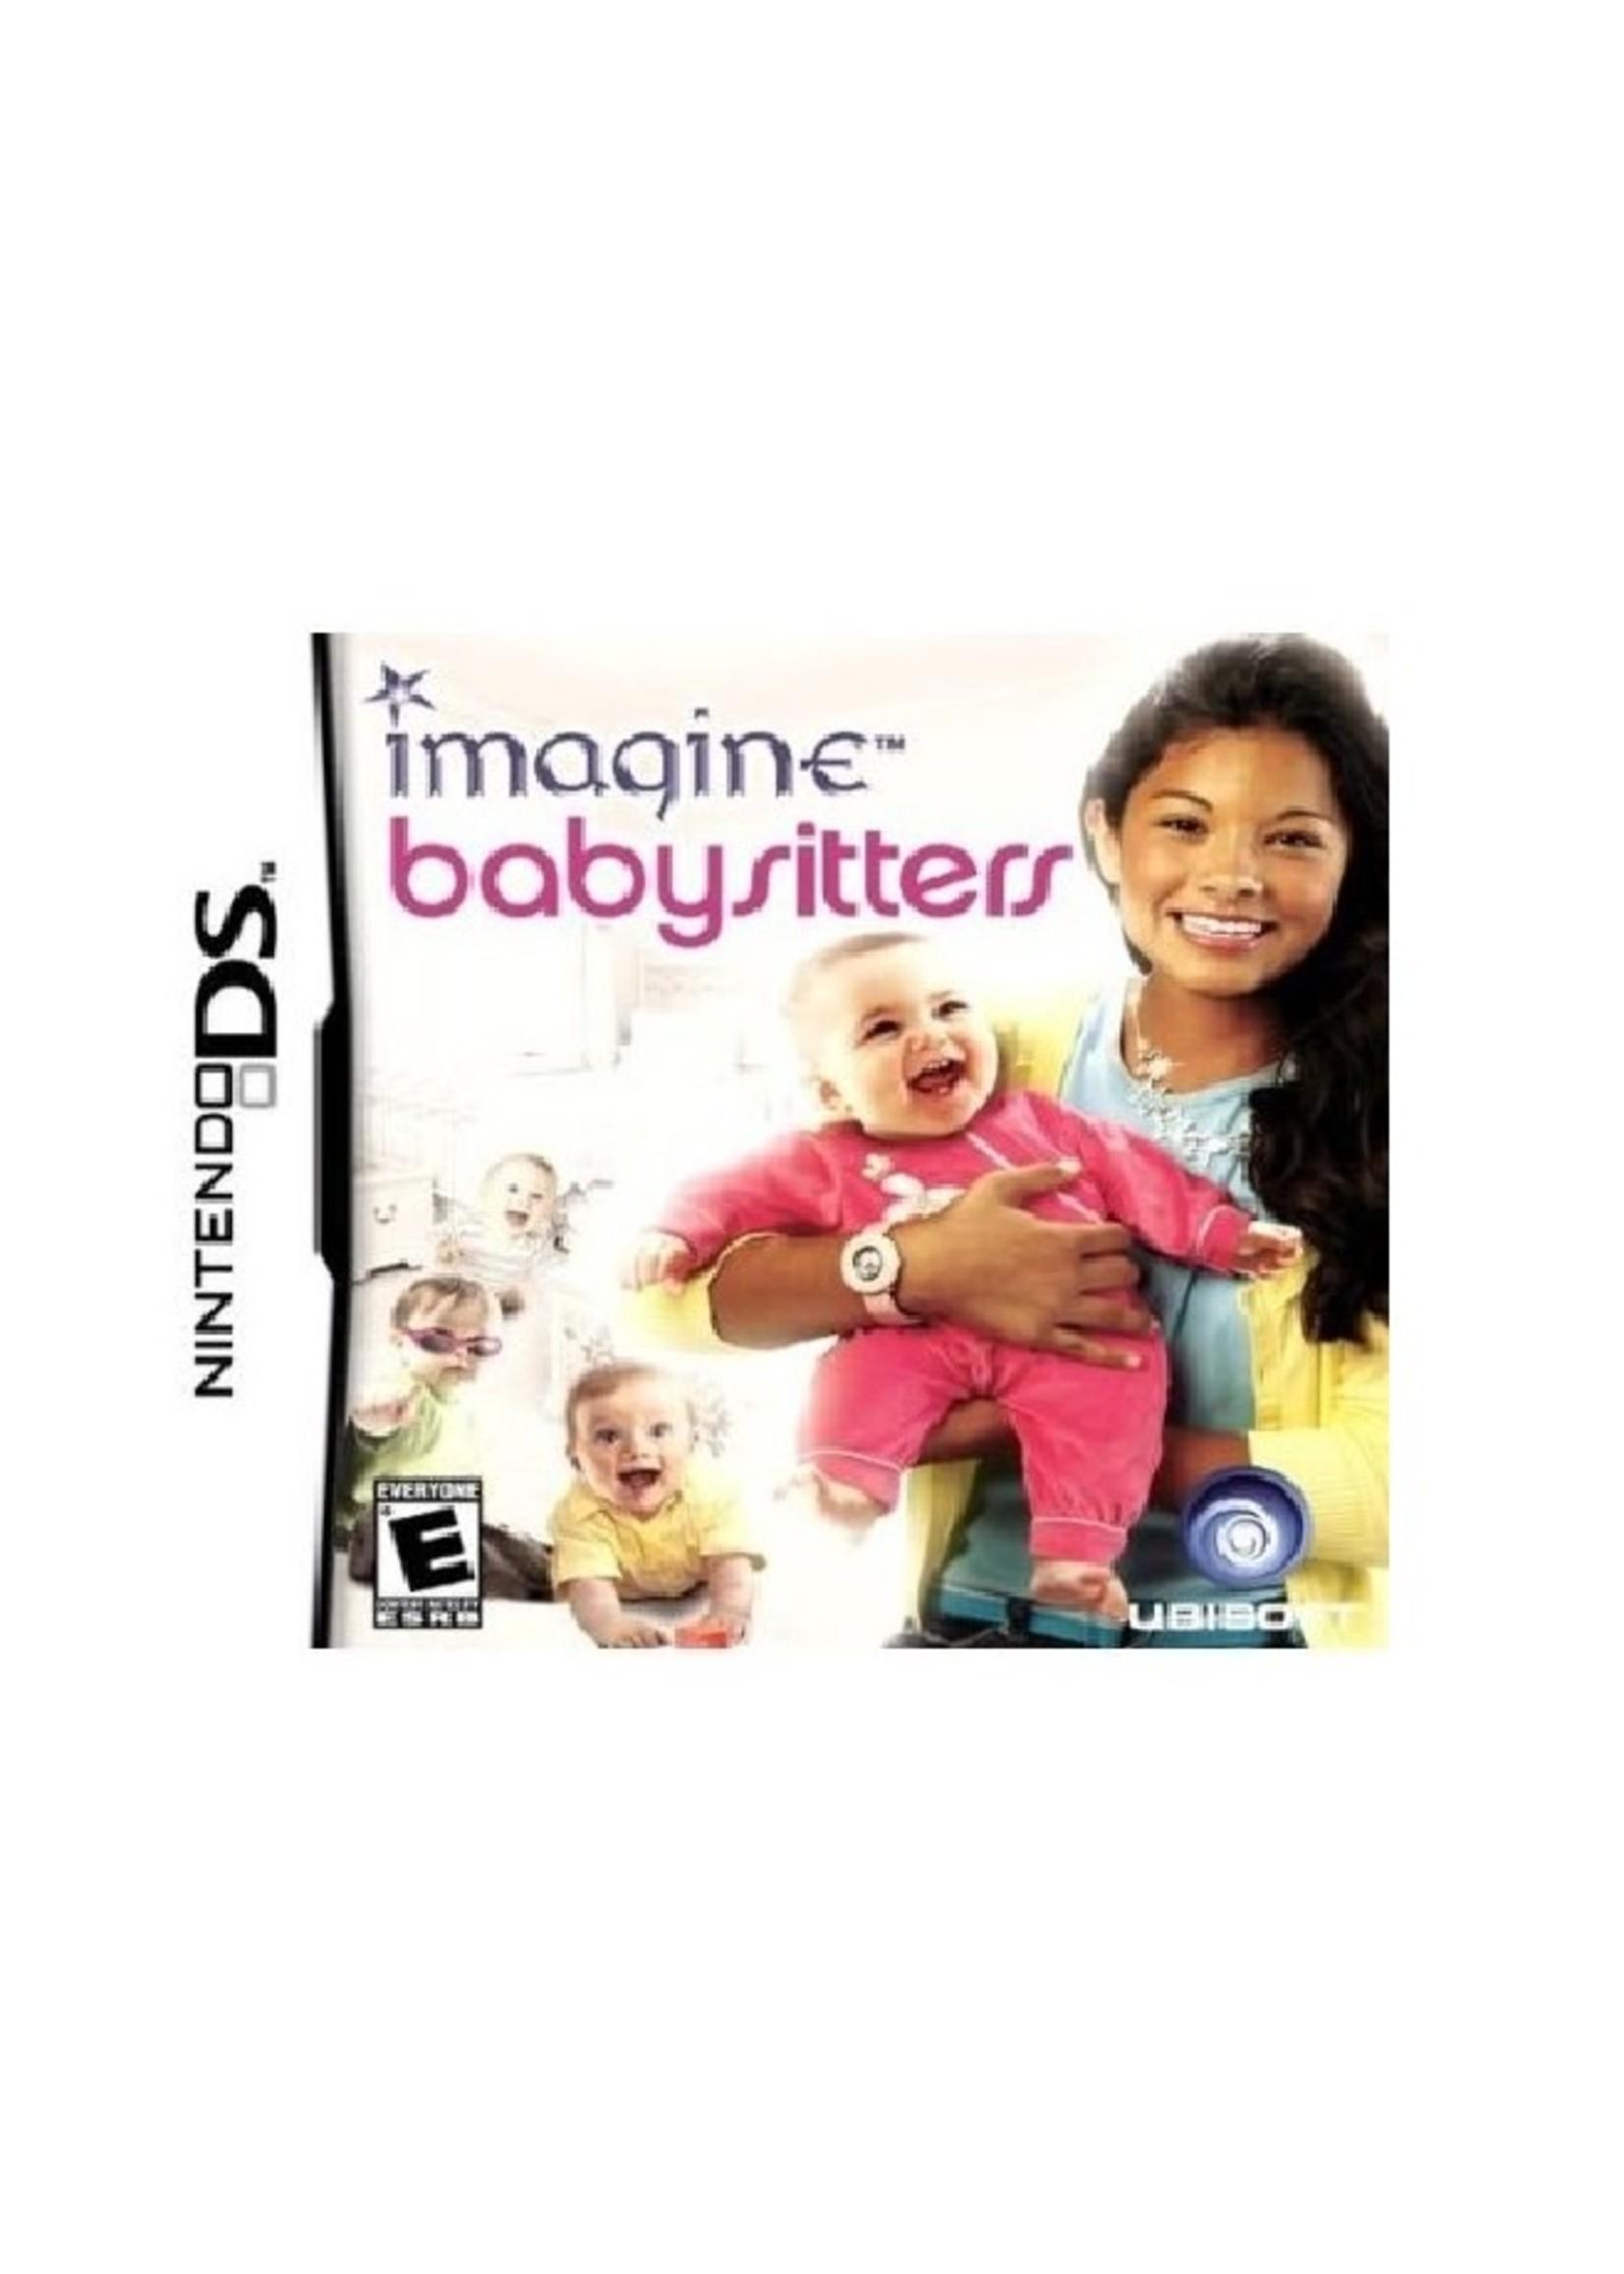 Imagine: Babysitters - NDS PrePlayed